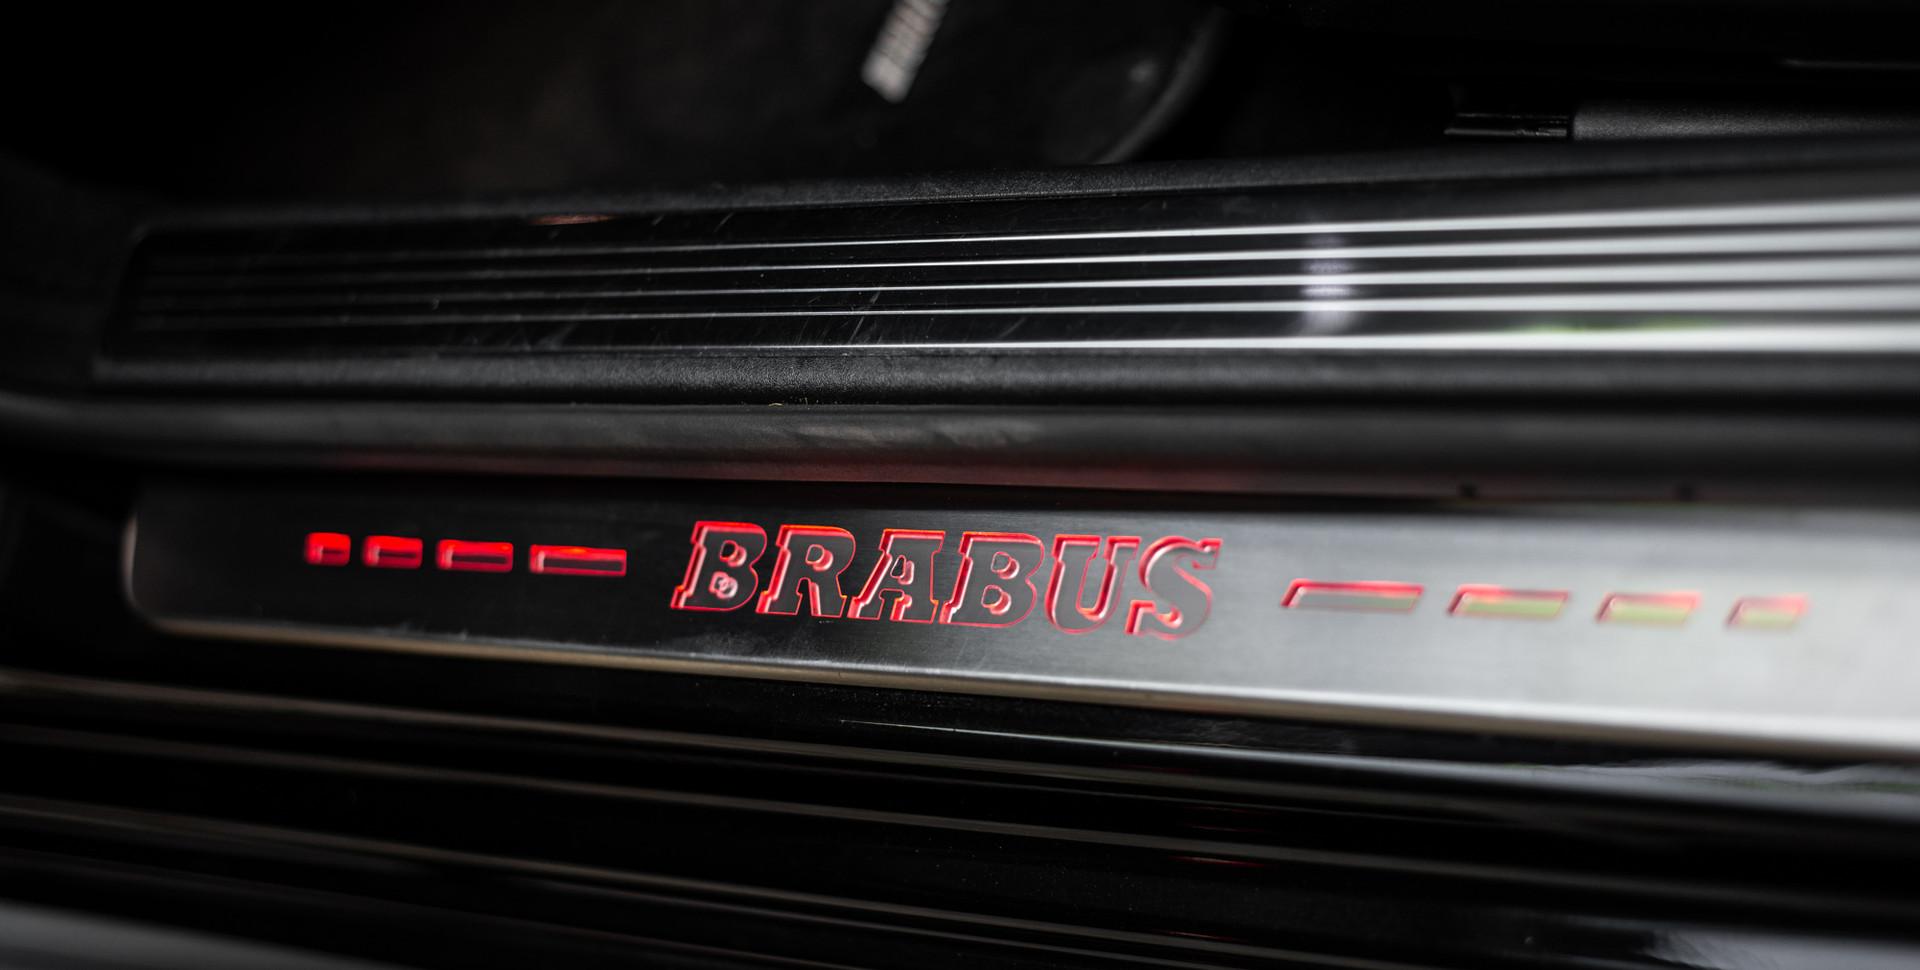 MB S63 AMG Brabus-24.jpg